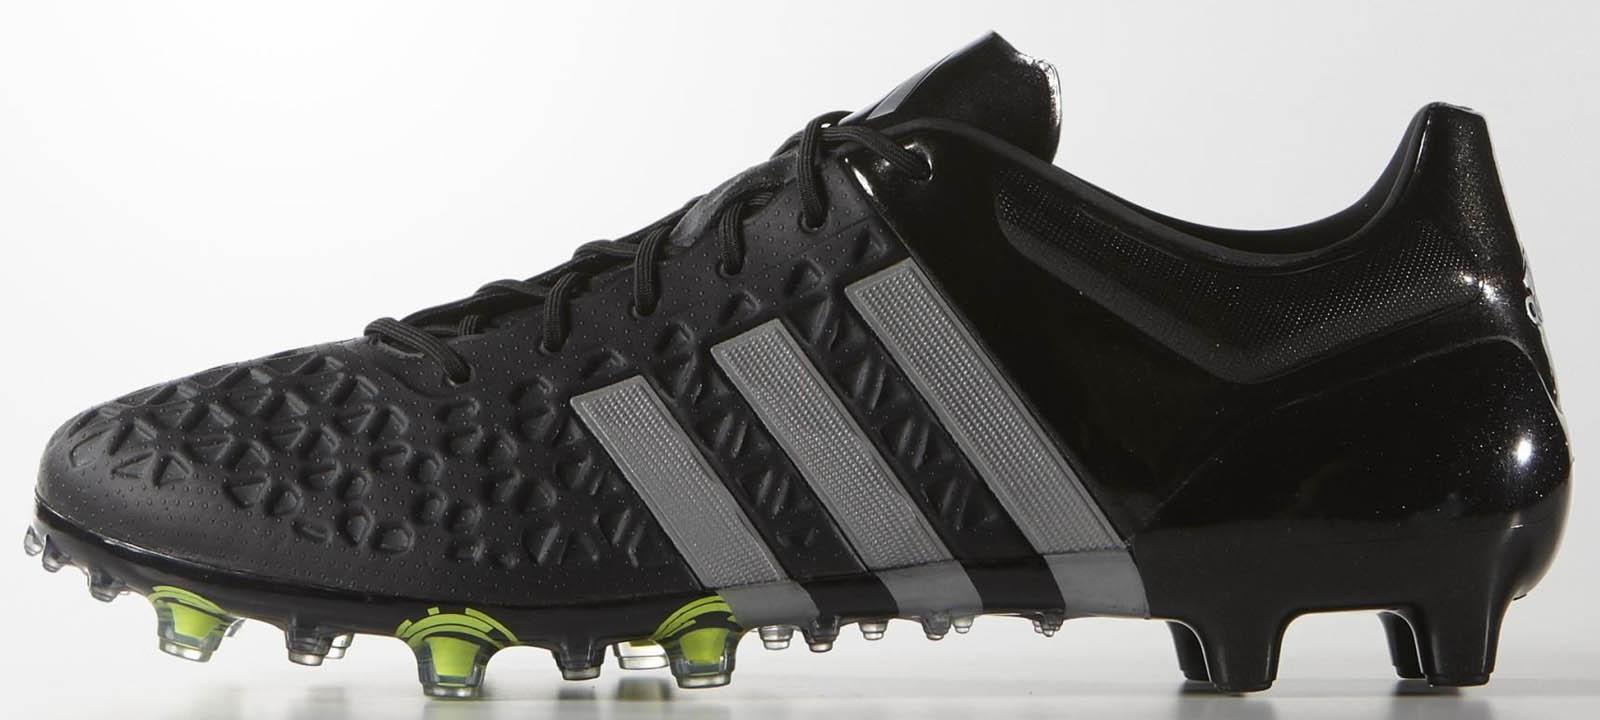 adidas ace 15.1 all black